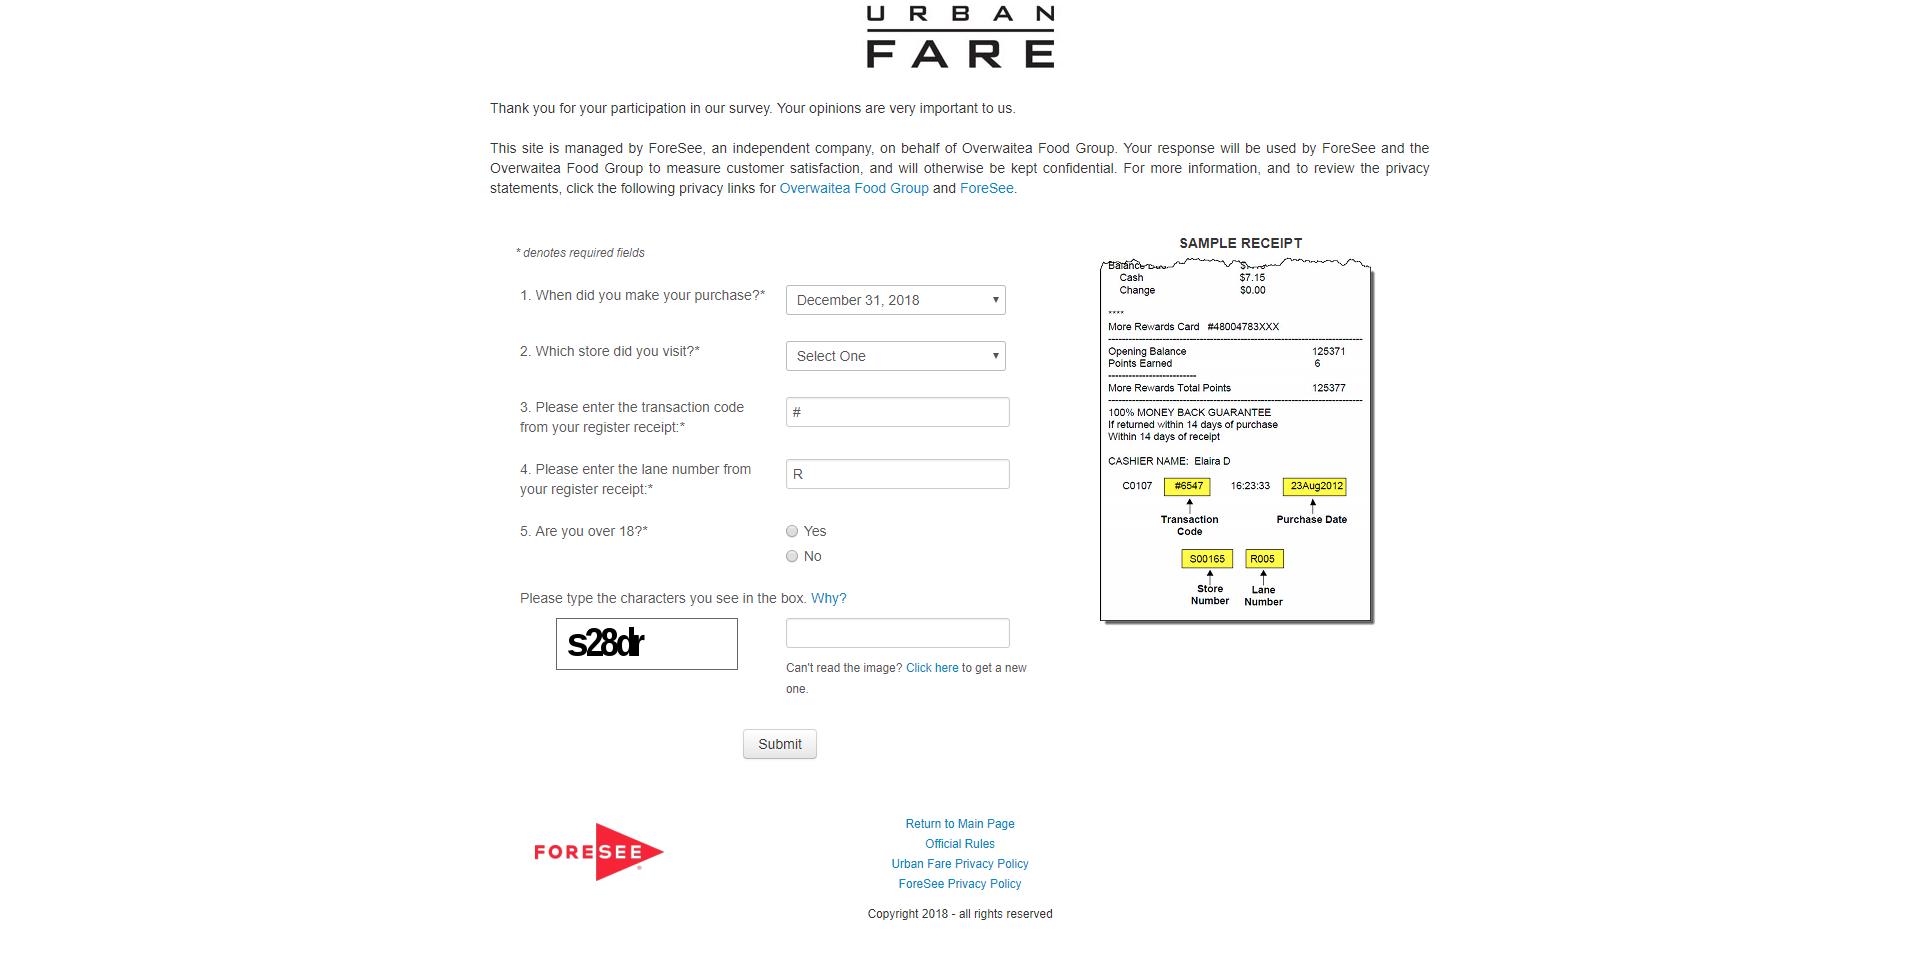 www.urbanfare.com/survey